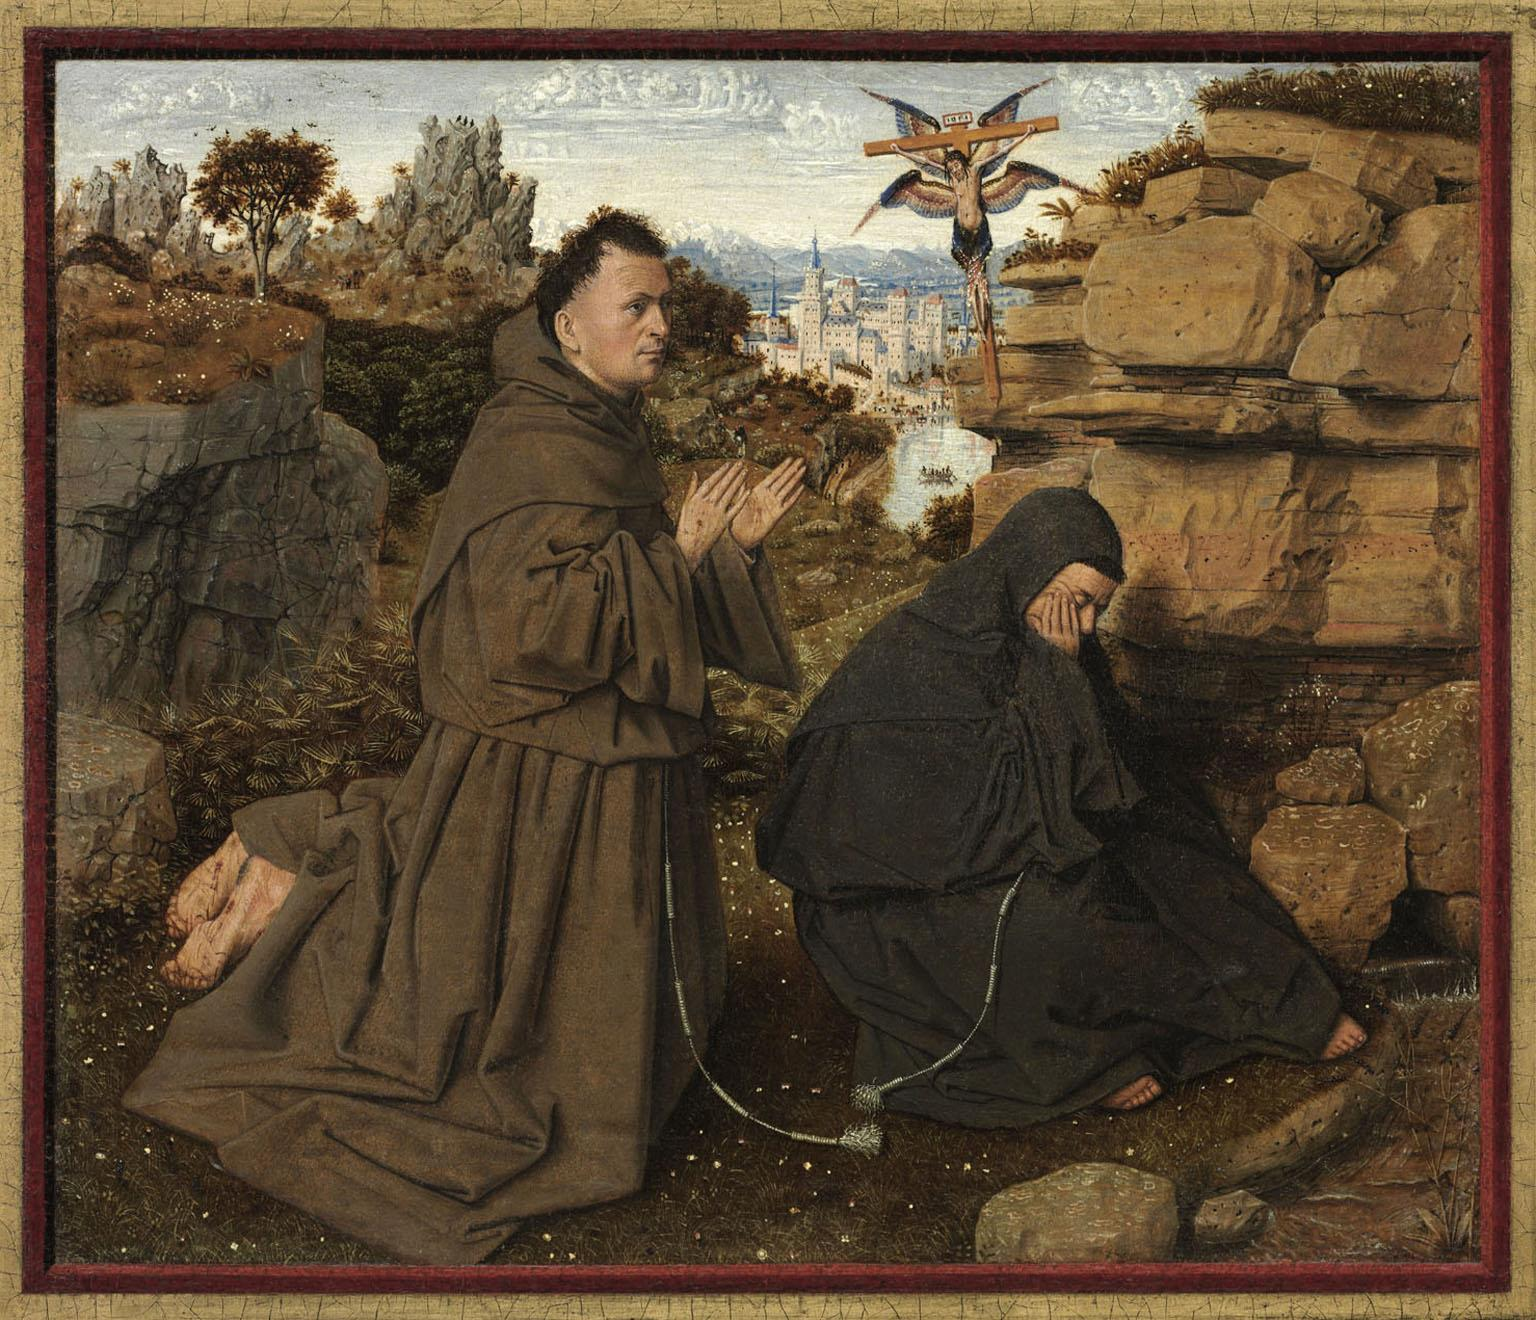 Fig. 4: Jan van Eyck (1390-1441), St. Francis Receiving the Stigmata , 1430-1432, John G. Johnson Collection, 1917, Philadelphia Museum of Art